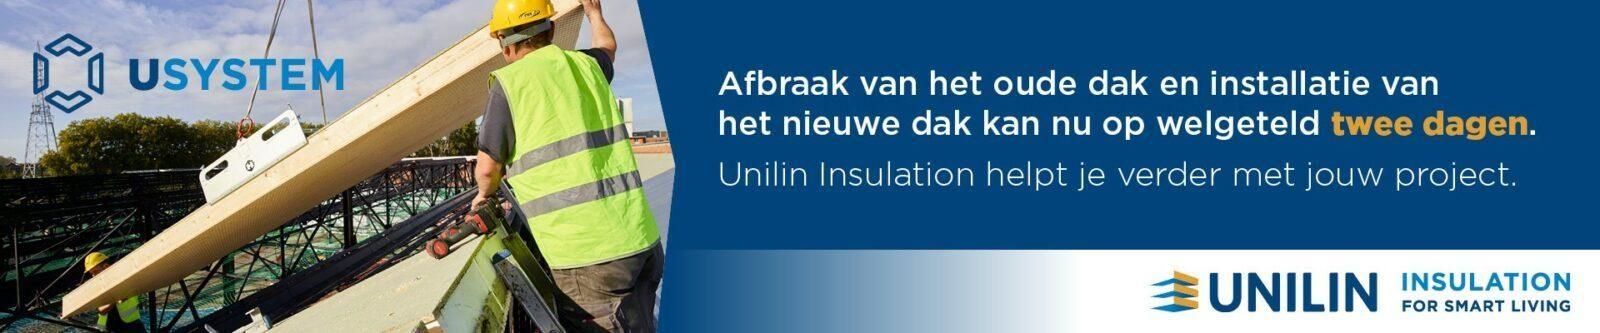 Banner pagina dakwerkers - renovate your roof